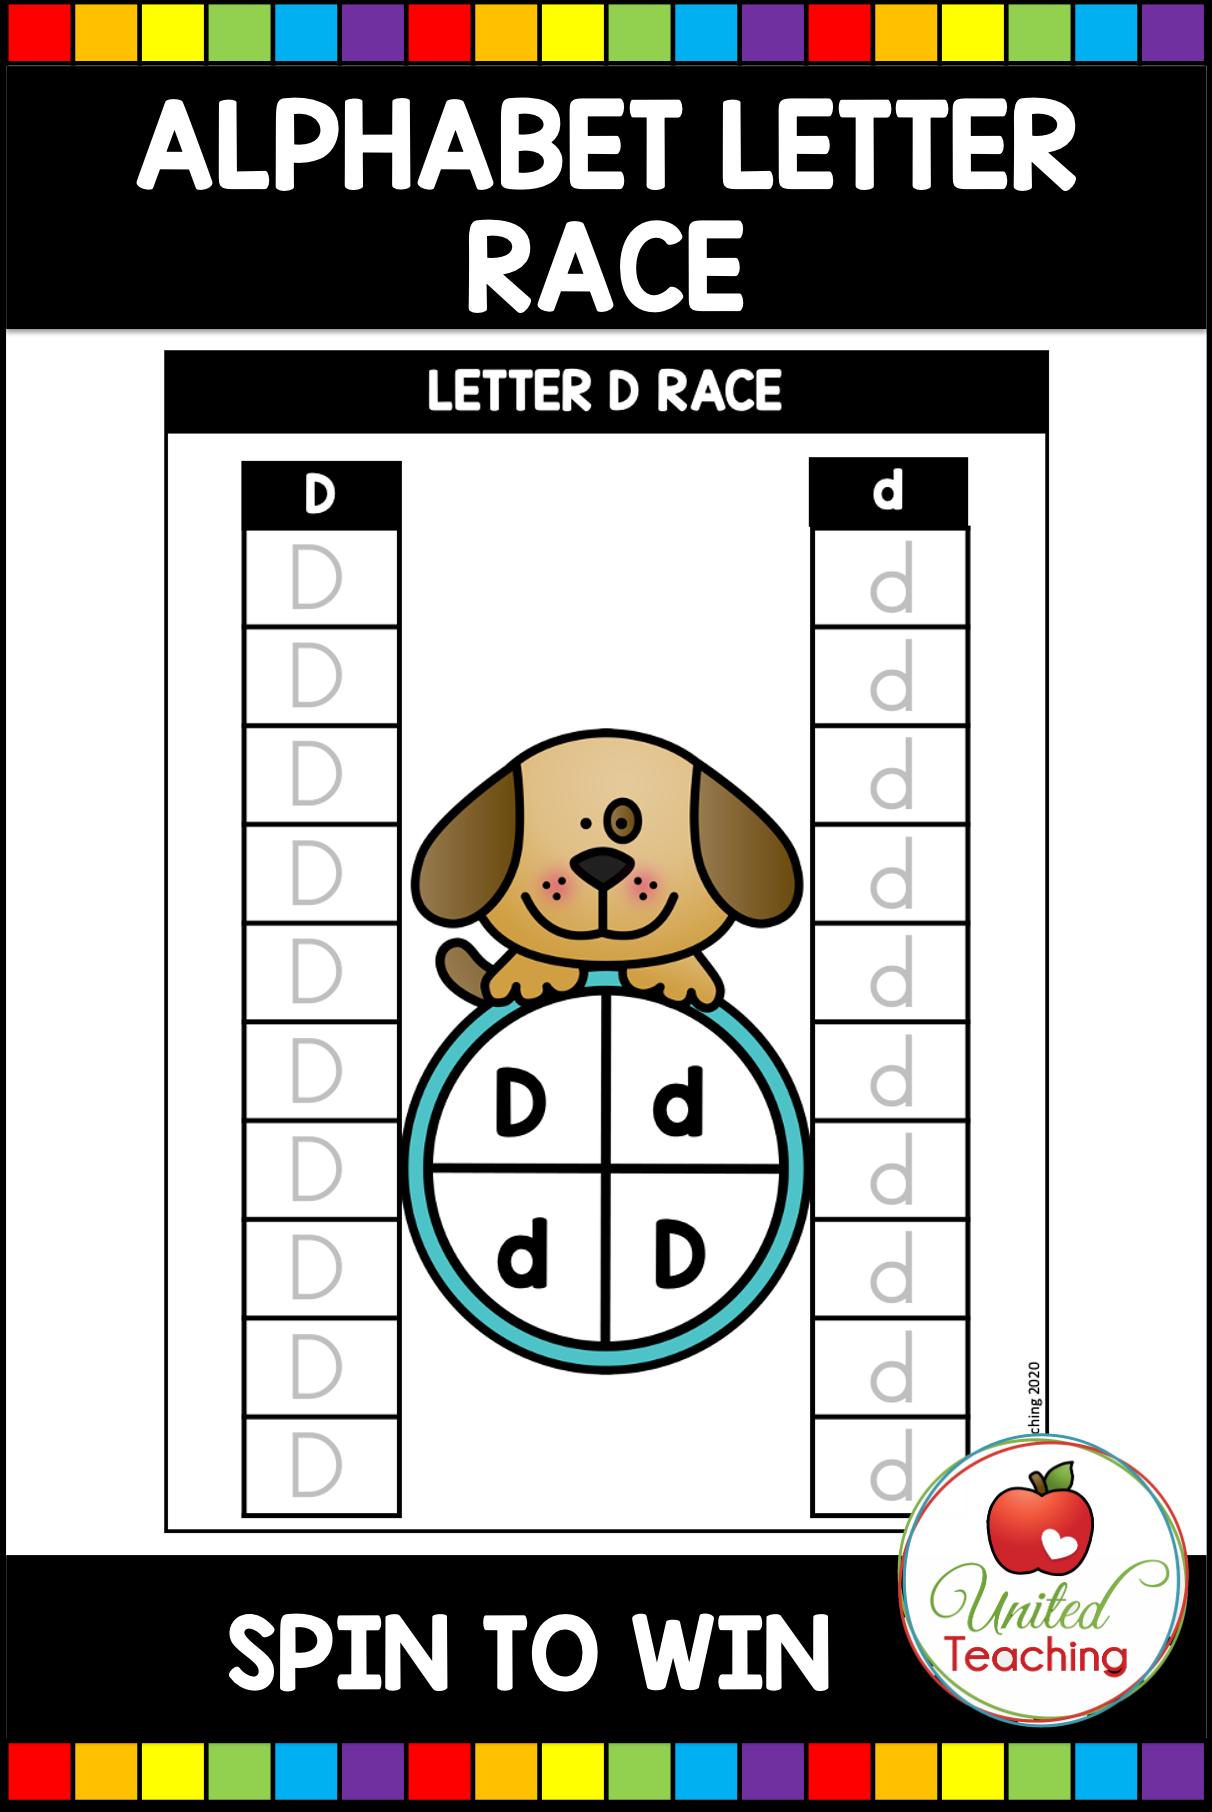 For 24 Hours Alphabet Letter Race In